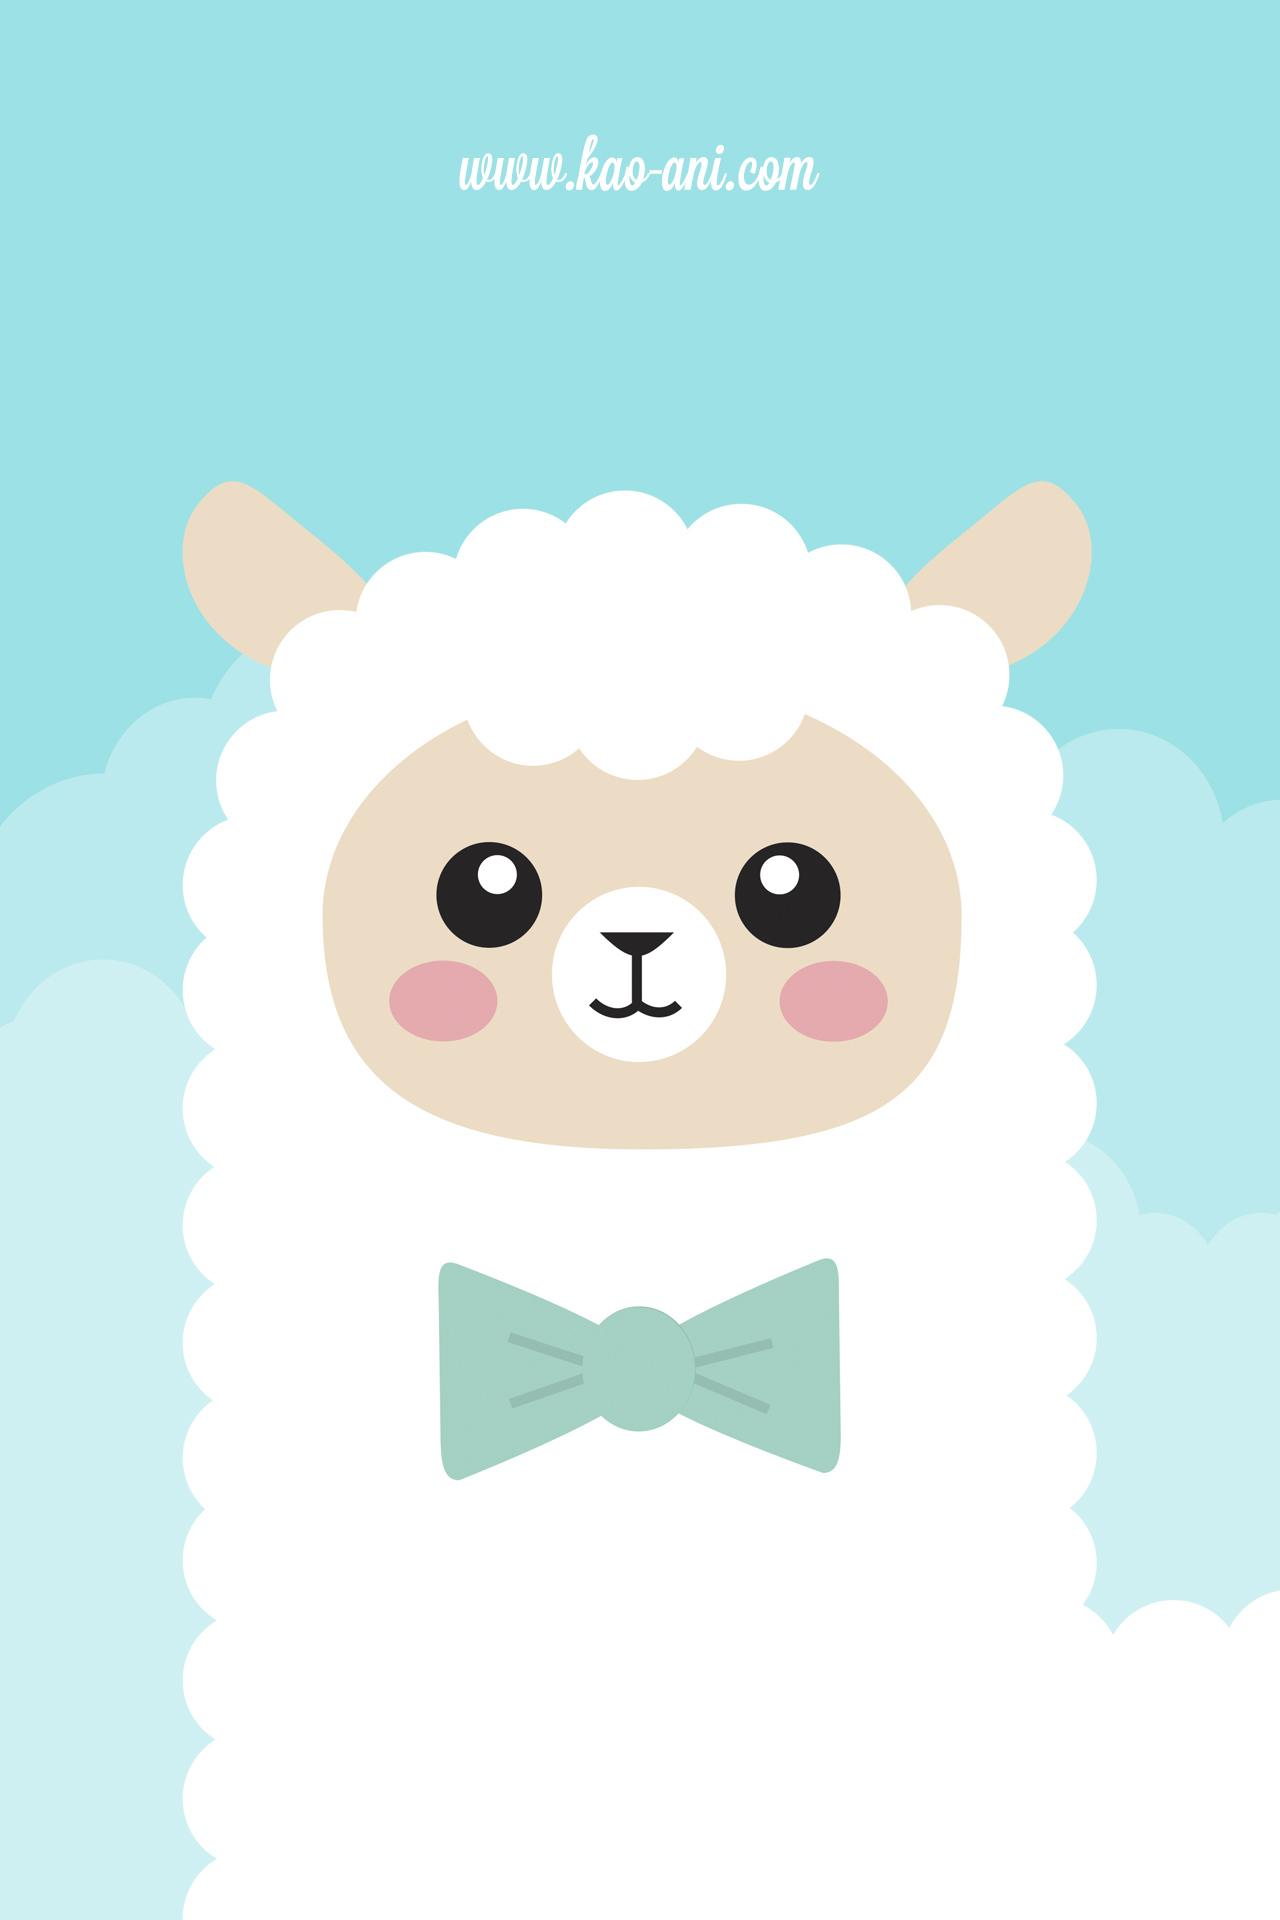 Alpaca iPhone Wallpaper Kao anicom 1280x1920